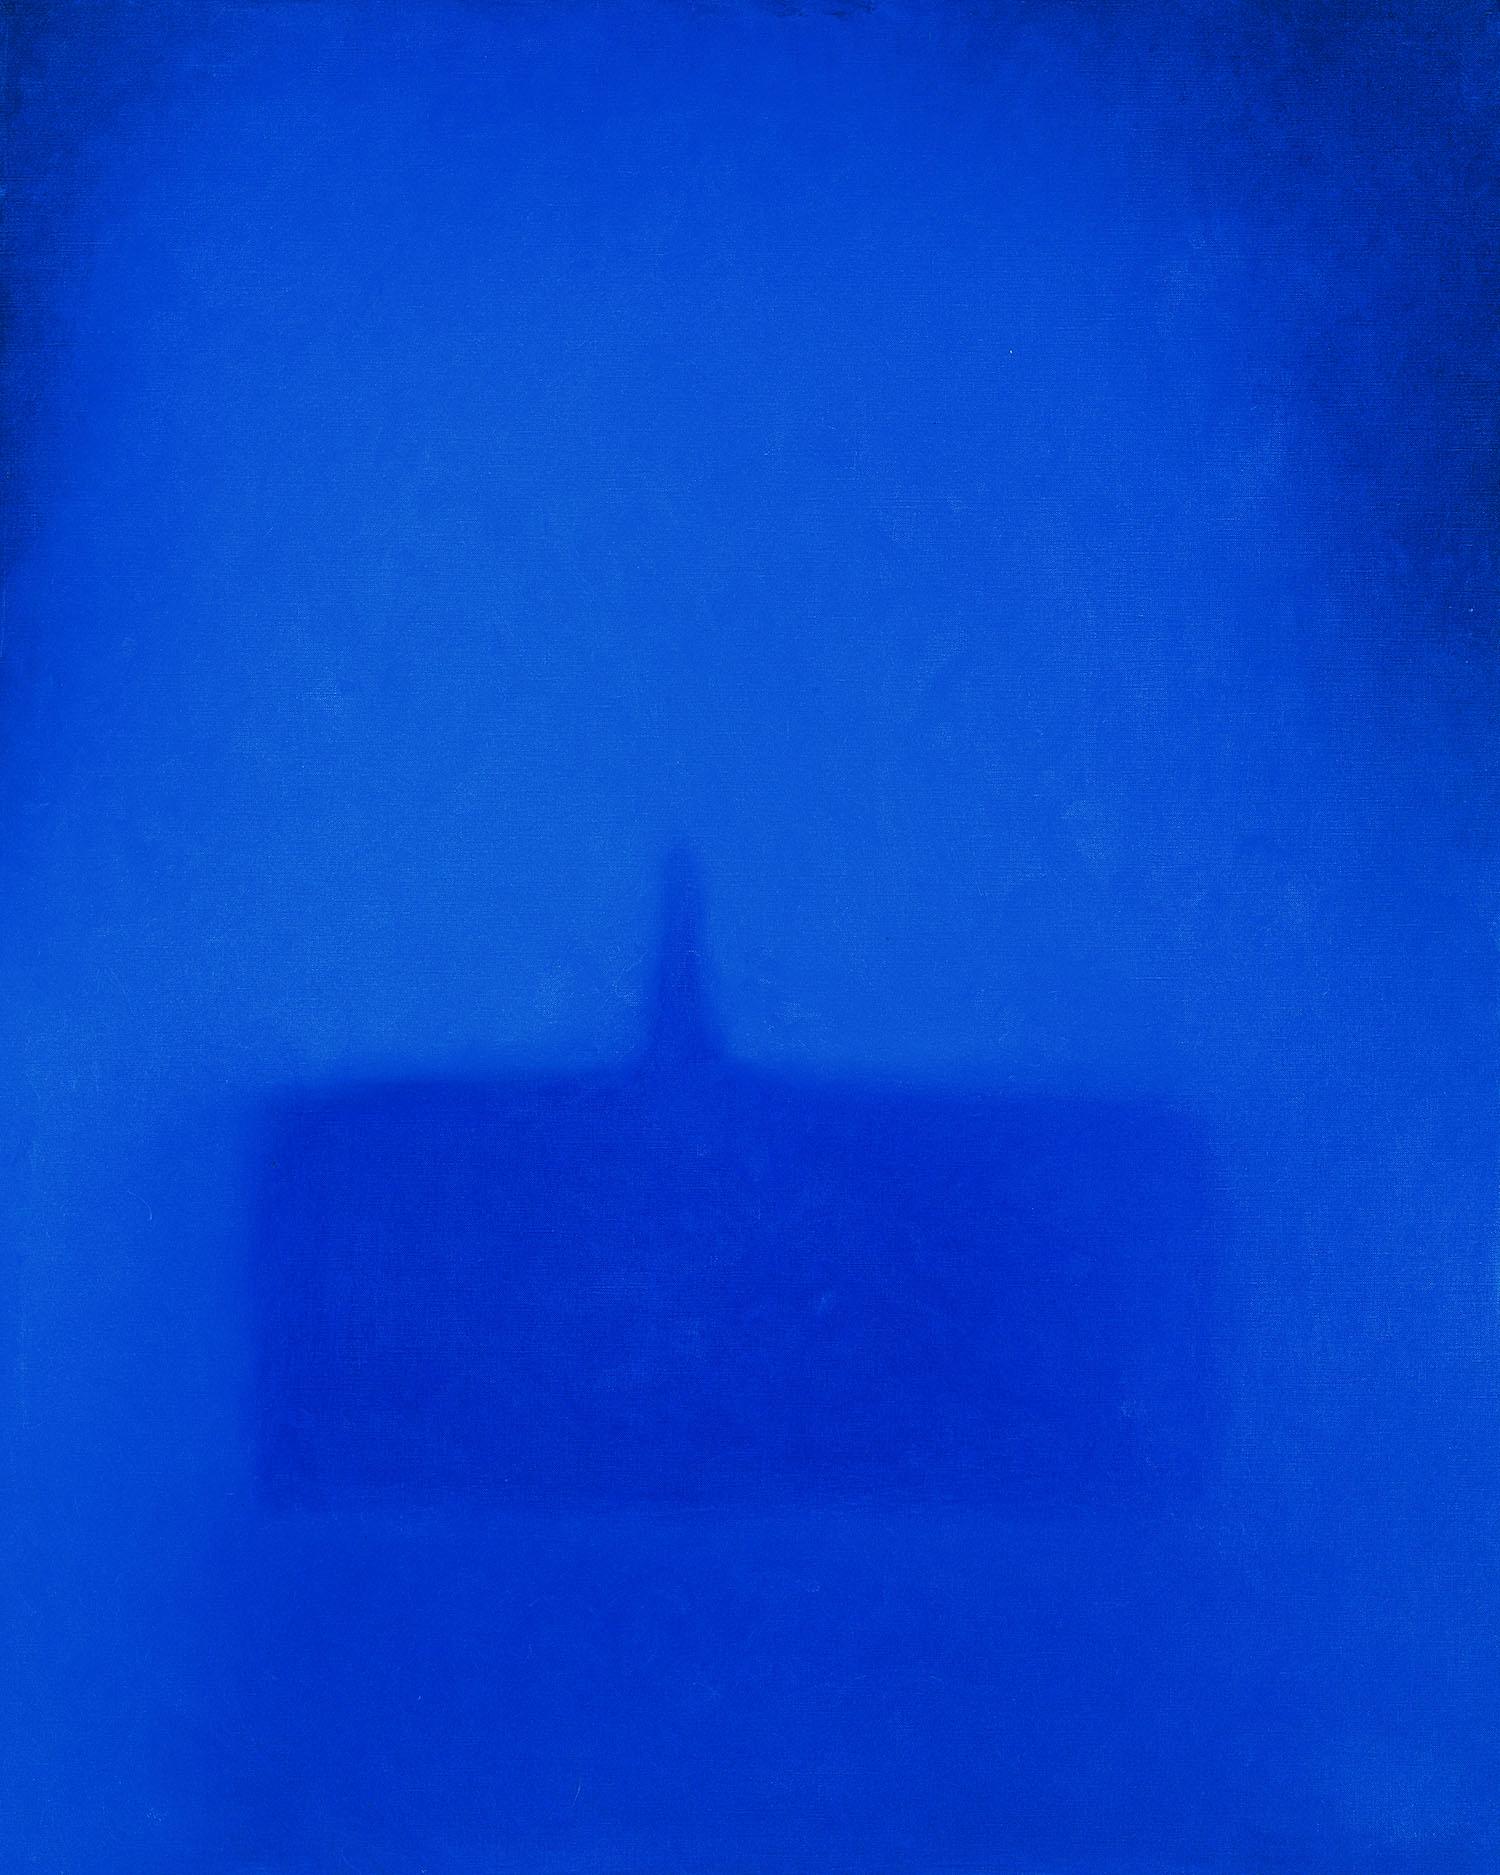 Atmósfera. Josep Navarro Vives. 2008, oli sobre tela, cm 81 x 100.